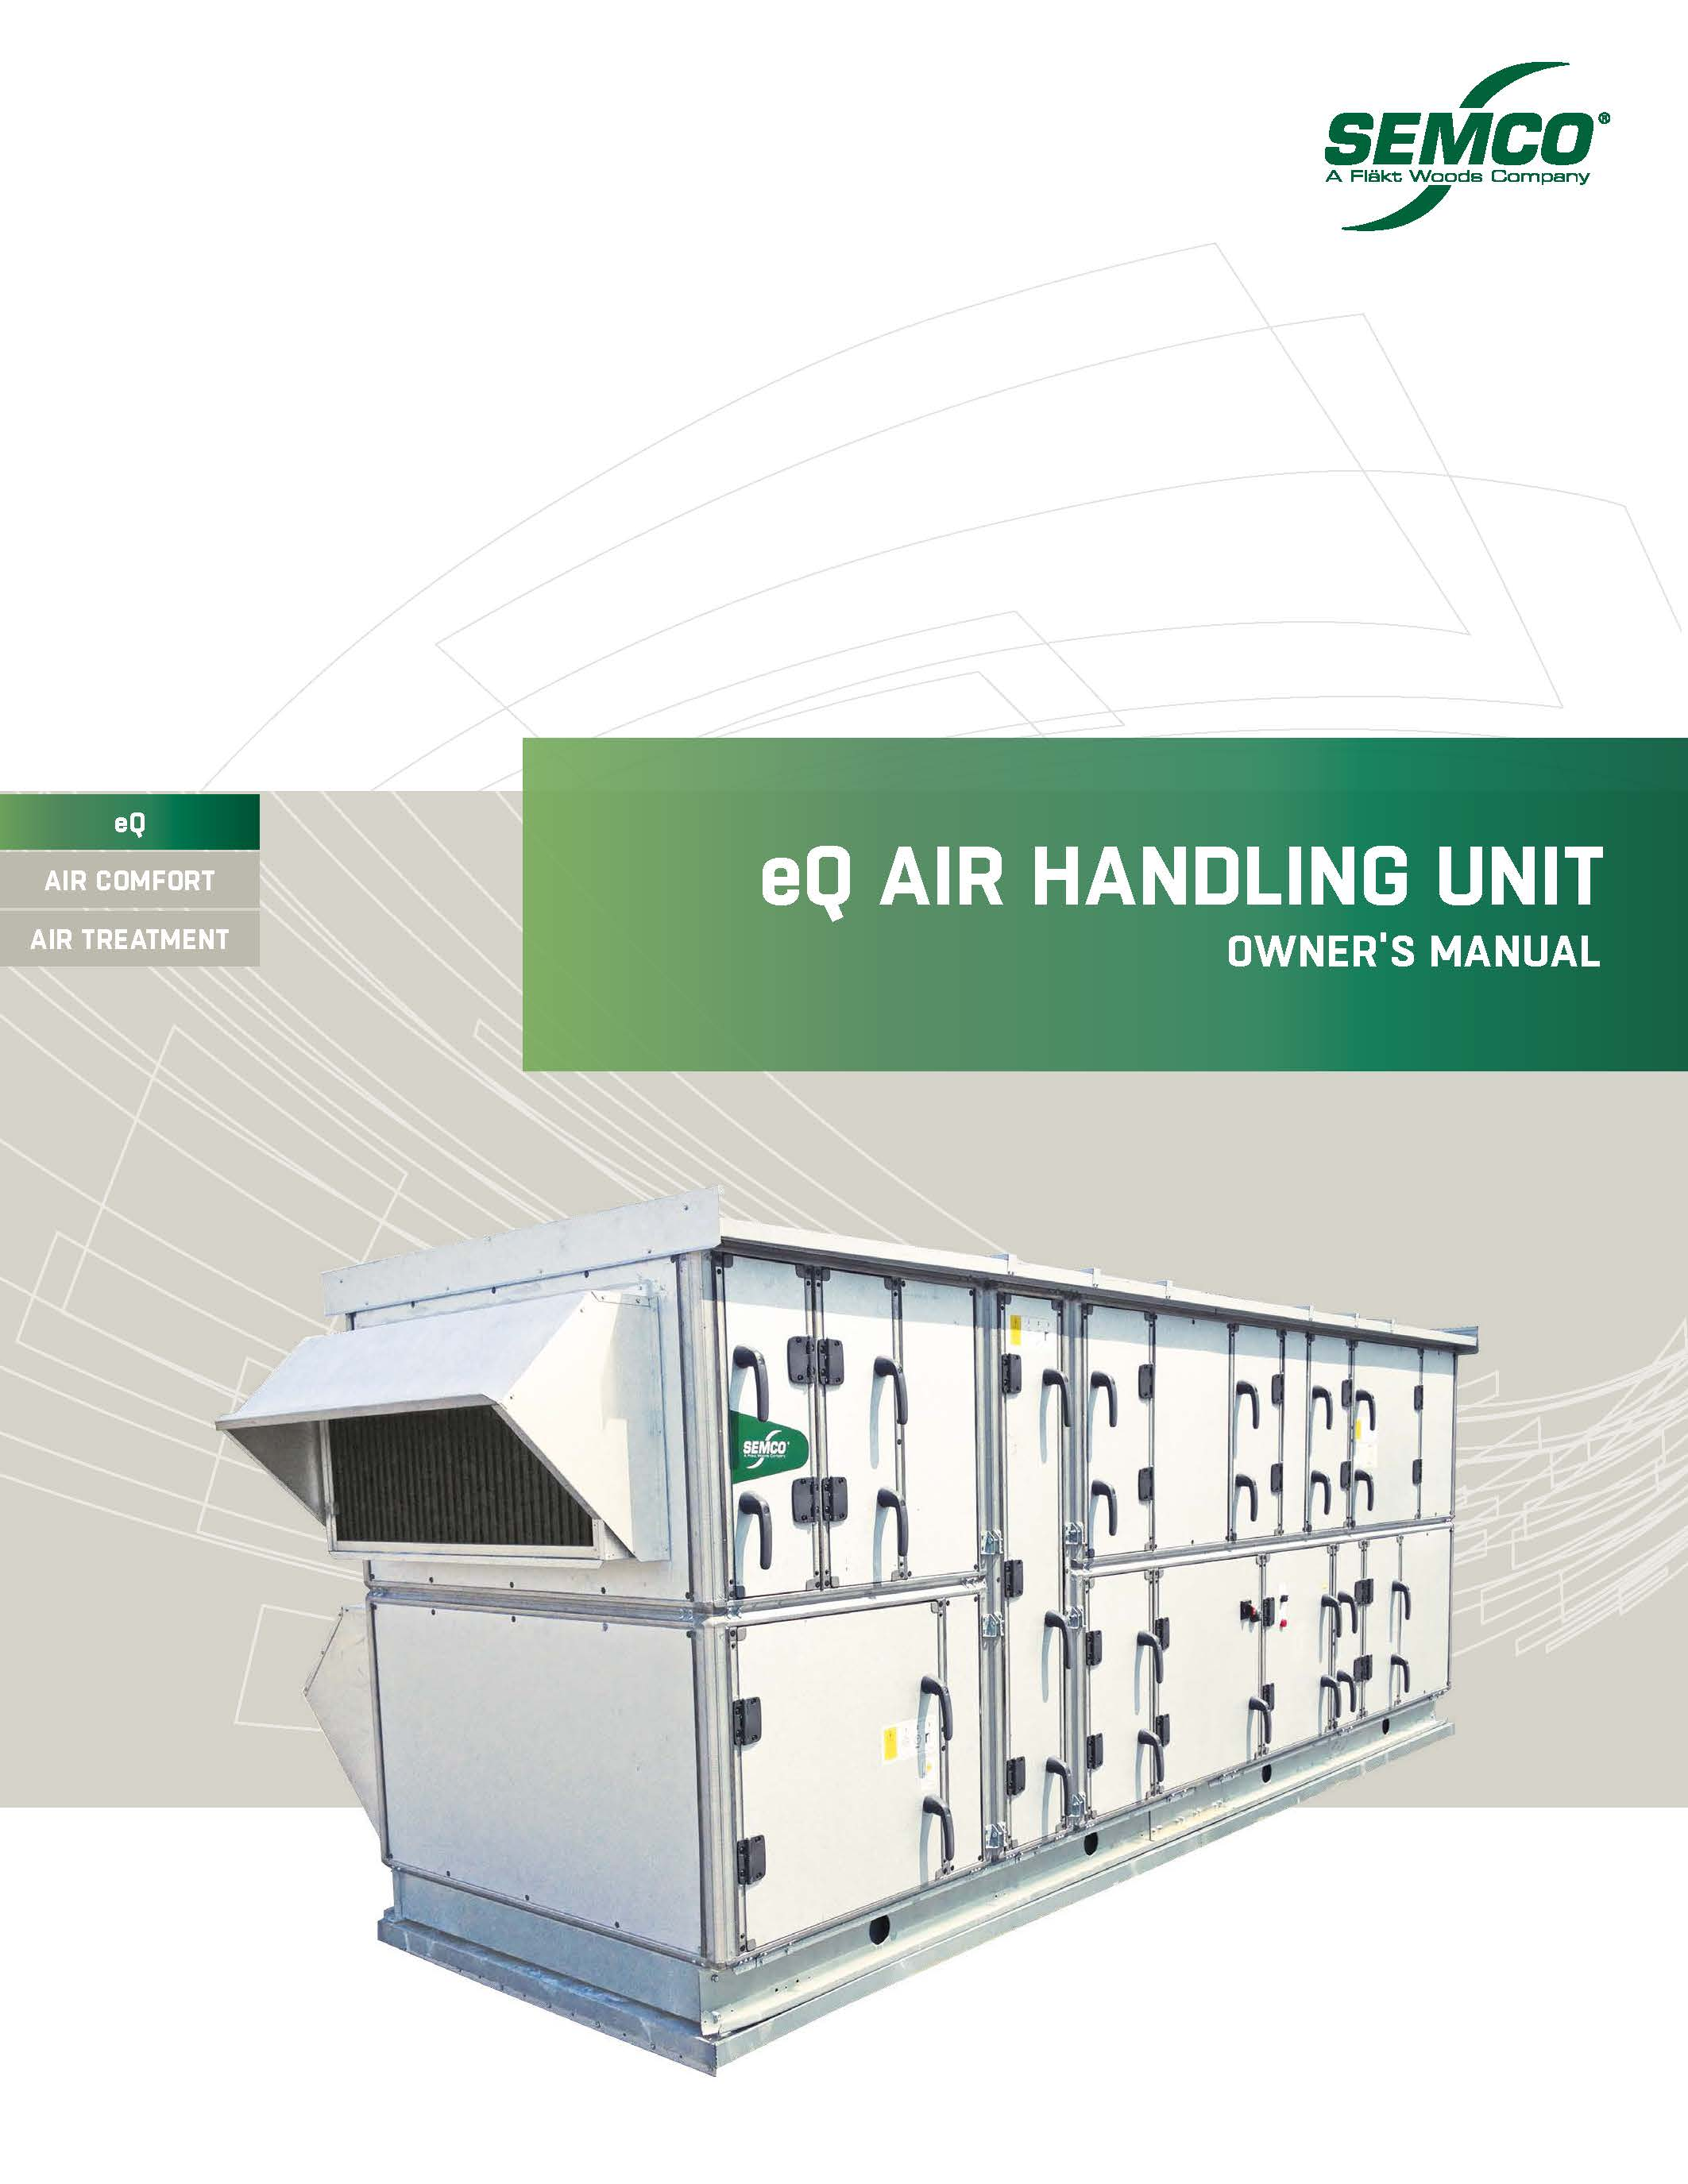 eQ_Air_Handling_Unit_Owners_Manual_-_SEMCO_10-15.jpg